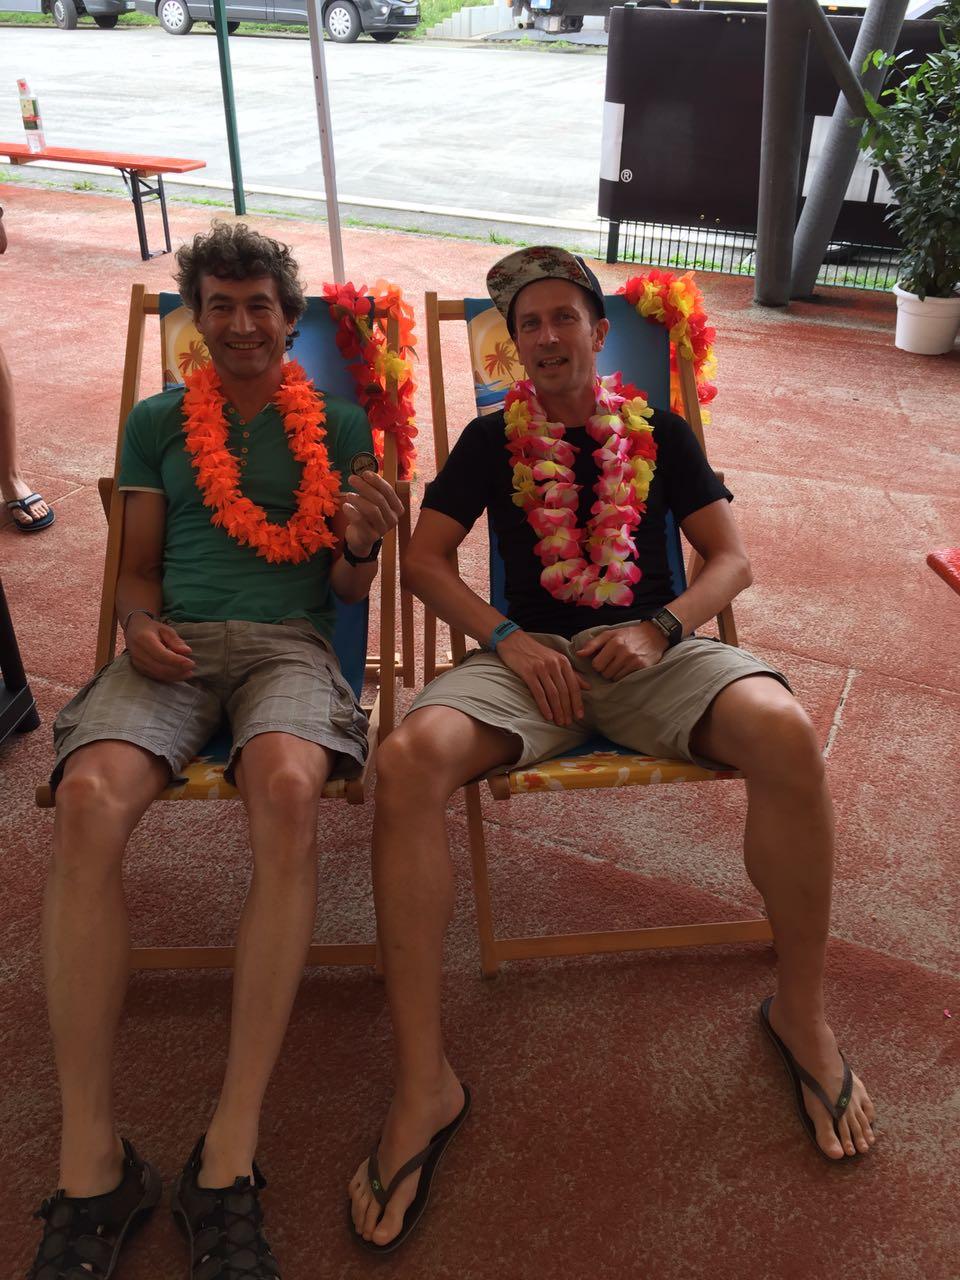 JoernUndRainer - Zwei Löwen fahren zum Ironman nach Hawaii!